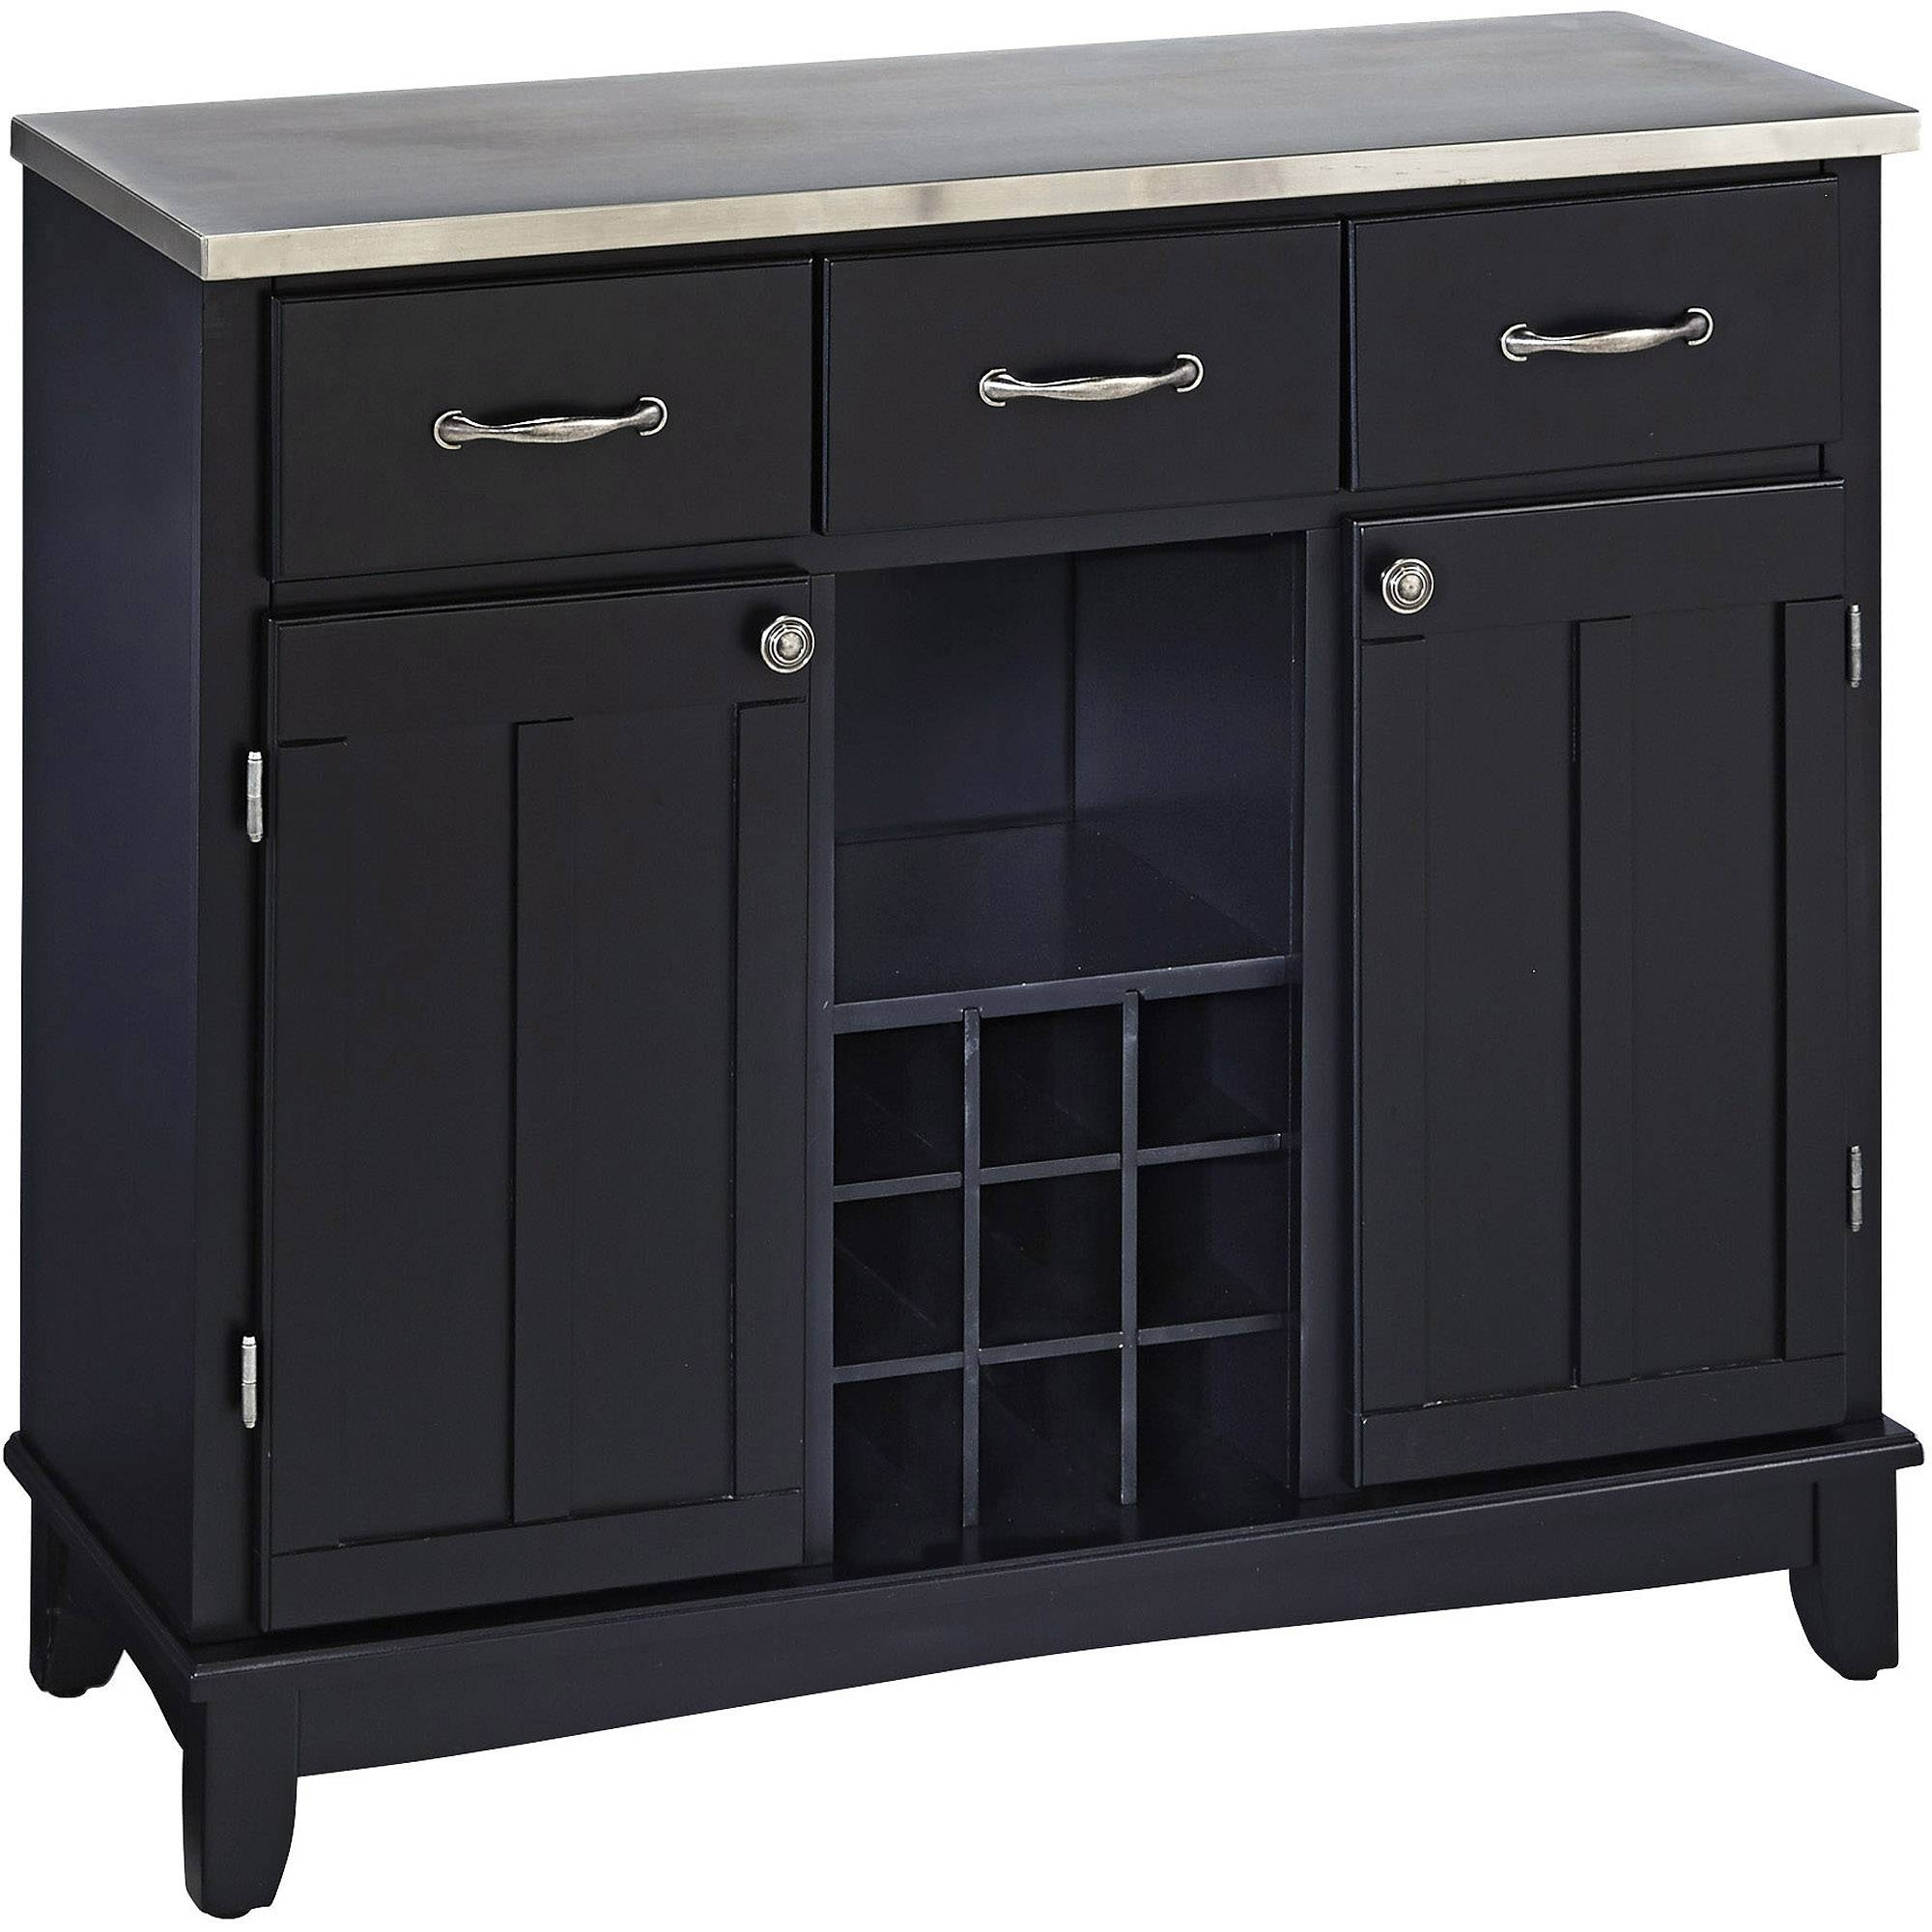 China Cabinet & Buffet Furniture : Kitchen & Dining Furniture Regarding Small Black Sideboards (#3 of 20)